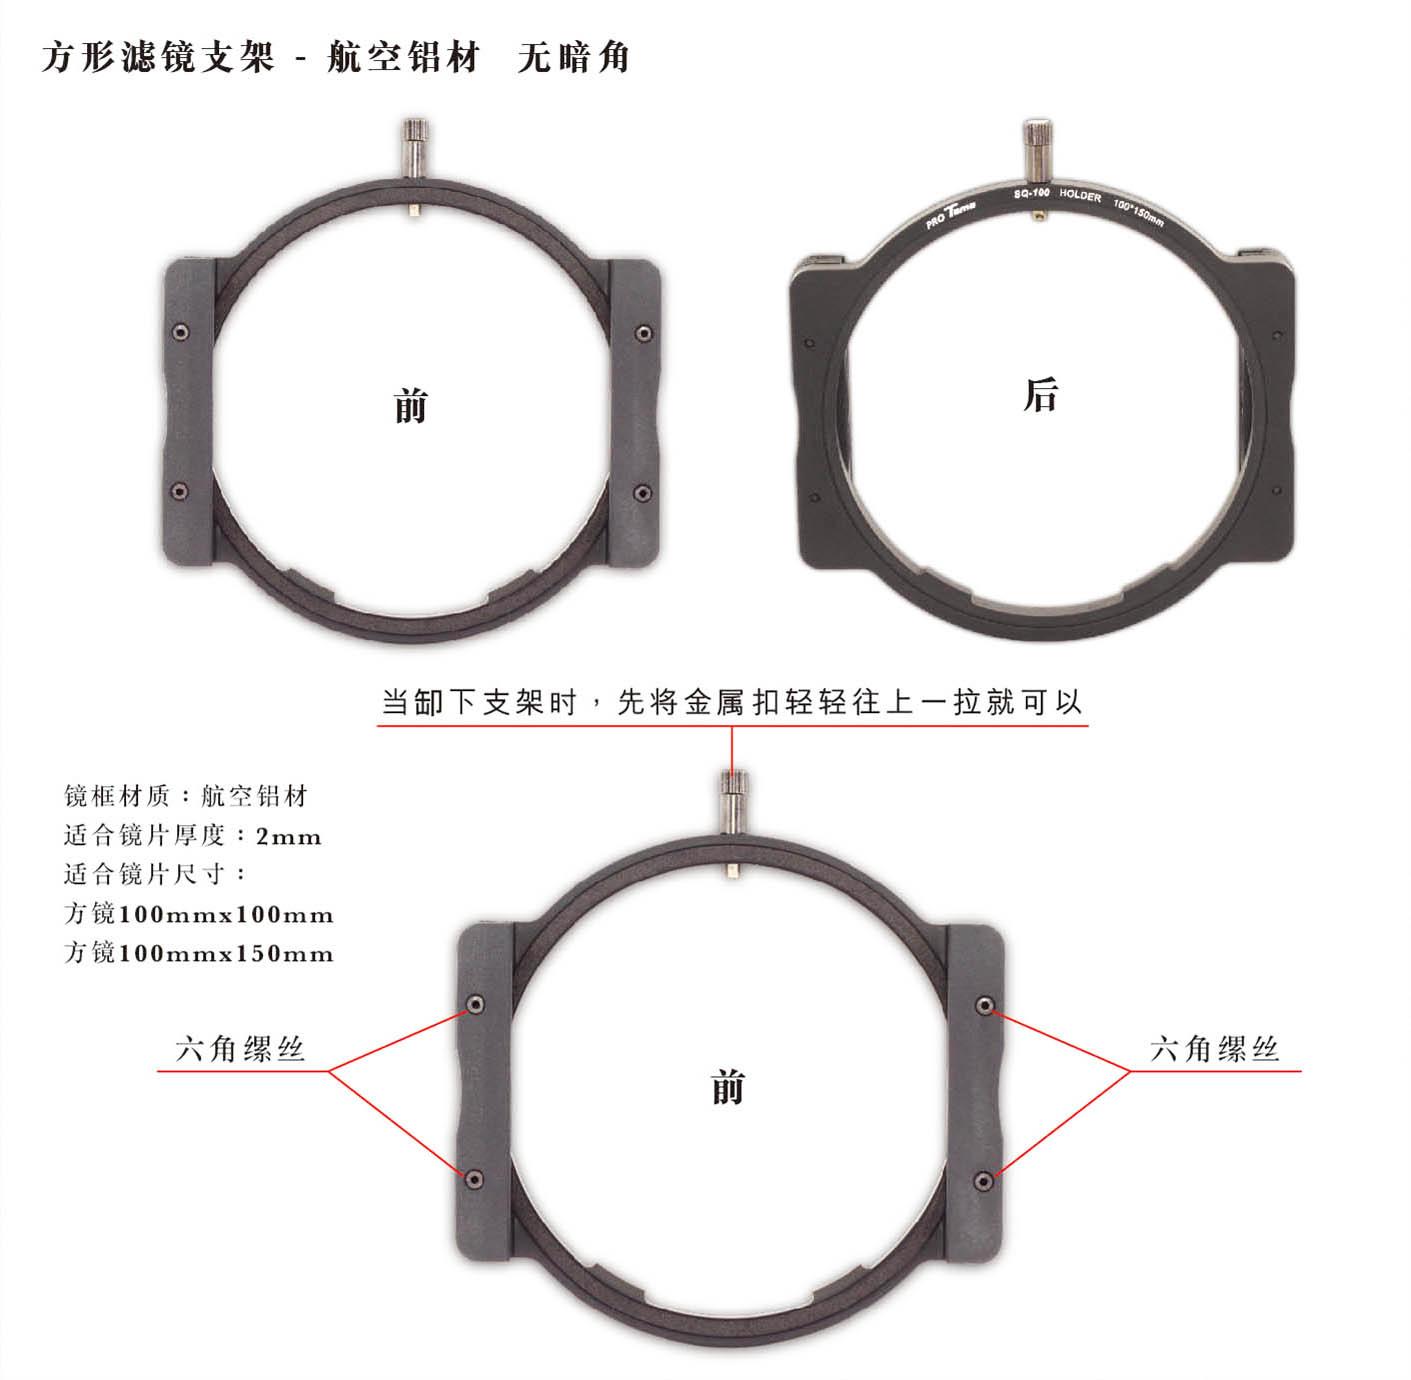 ProTama 天馬 (SQ-100) HD 高清方形濾鏡支架 (100x100/100x150mm) - 產品描述